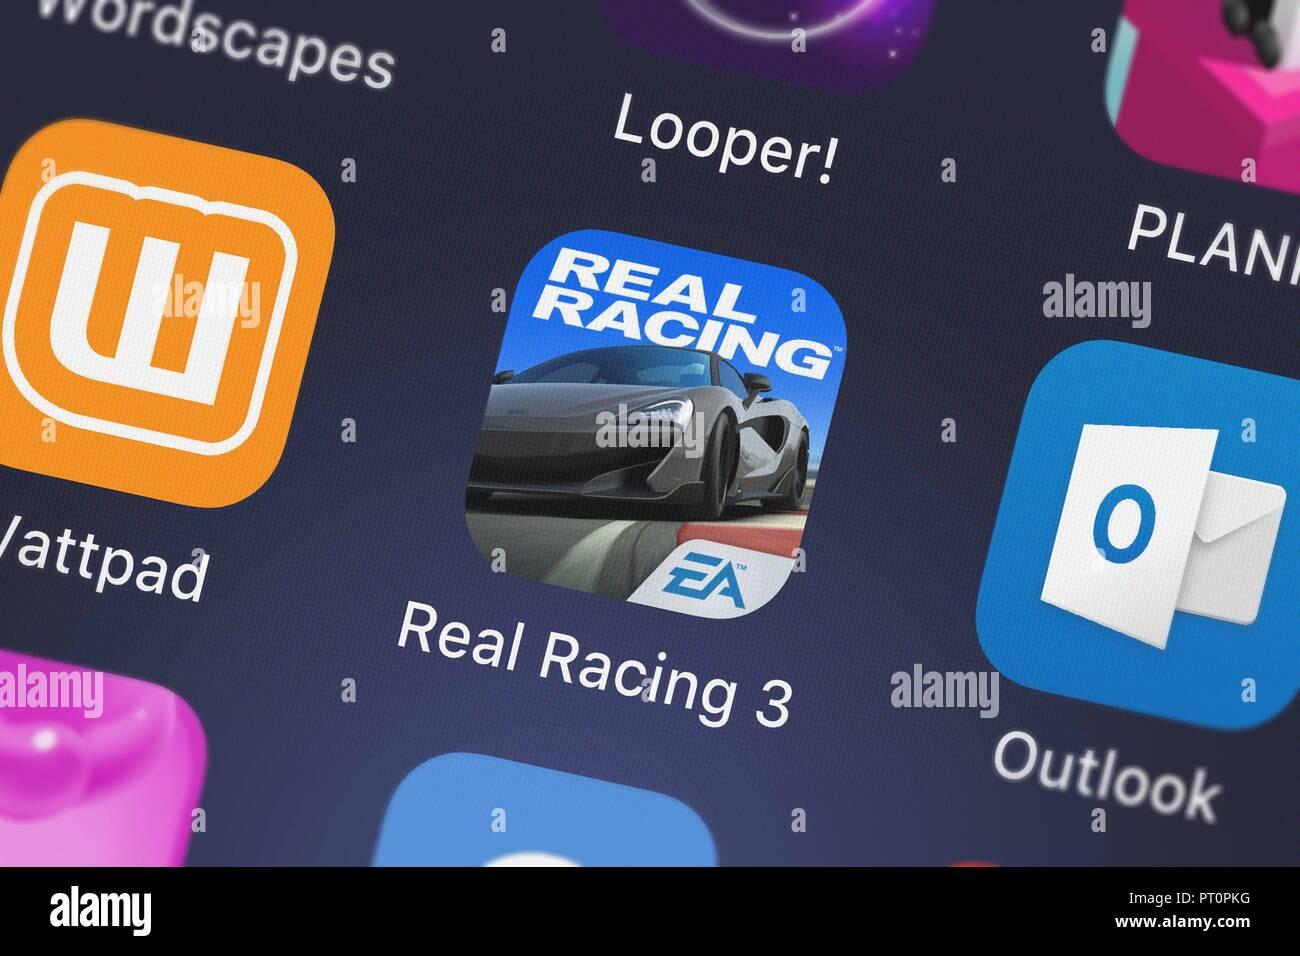 Londres, Royaume-Uni - Octobre 05, 2018: Capture d'Electronic Arts mobile app Real Racing 3. Banque D'Images